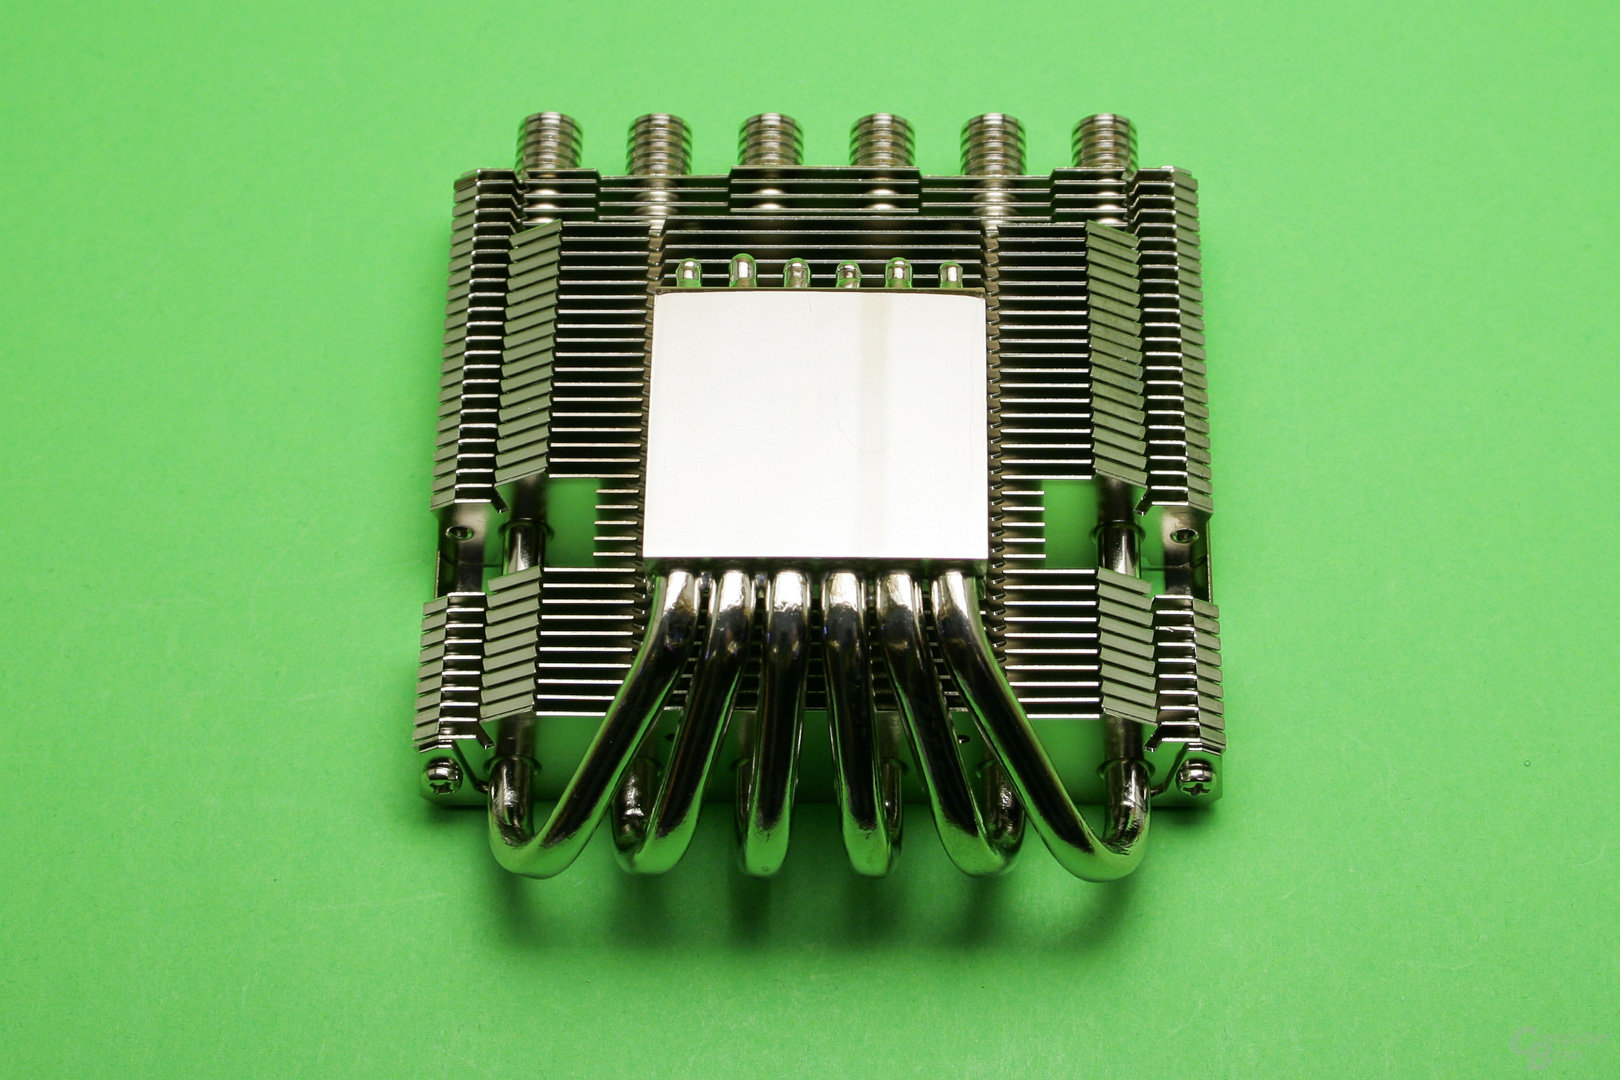 Thermalright AXP-100RH: Vernickelte Kupfer-Bodenplatte mit sechs Heatpipes